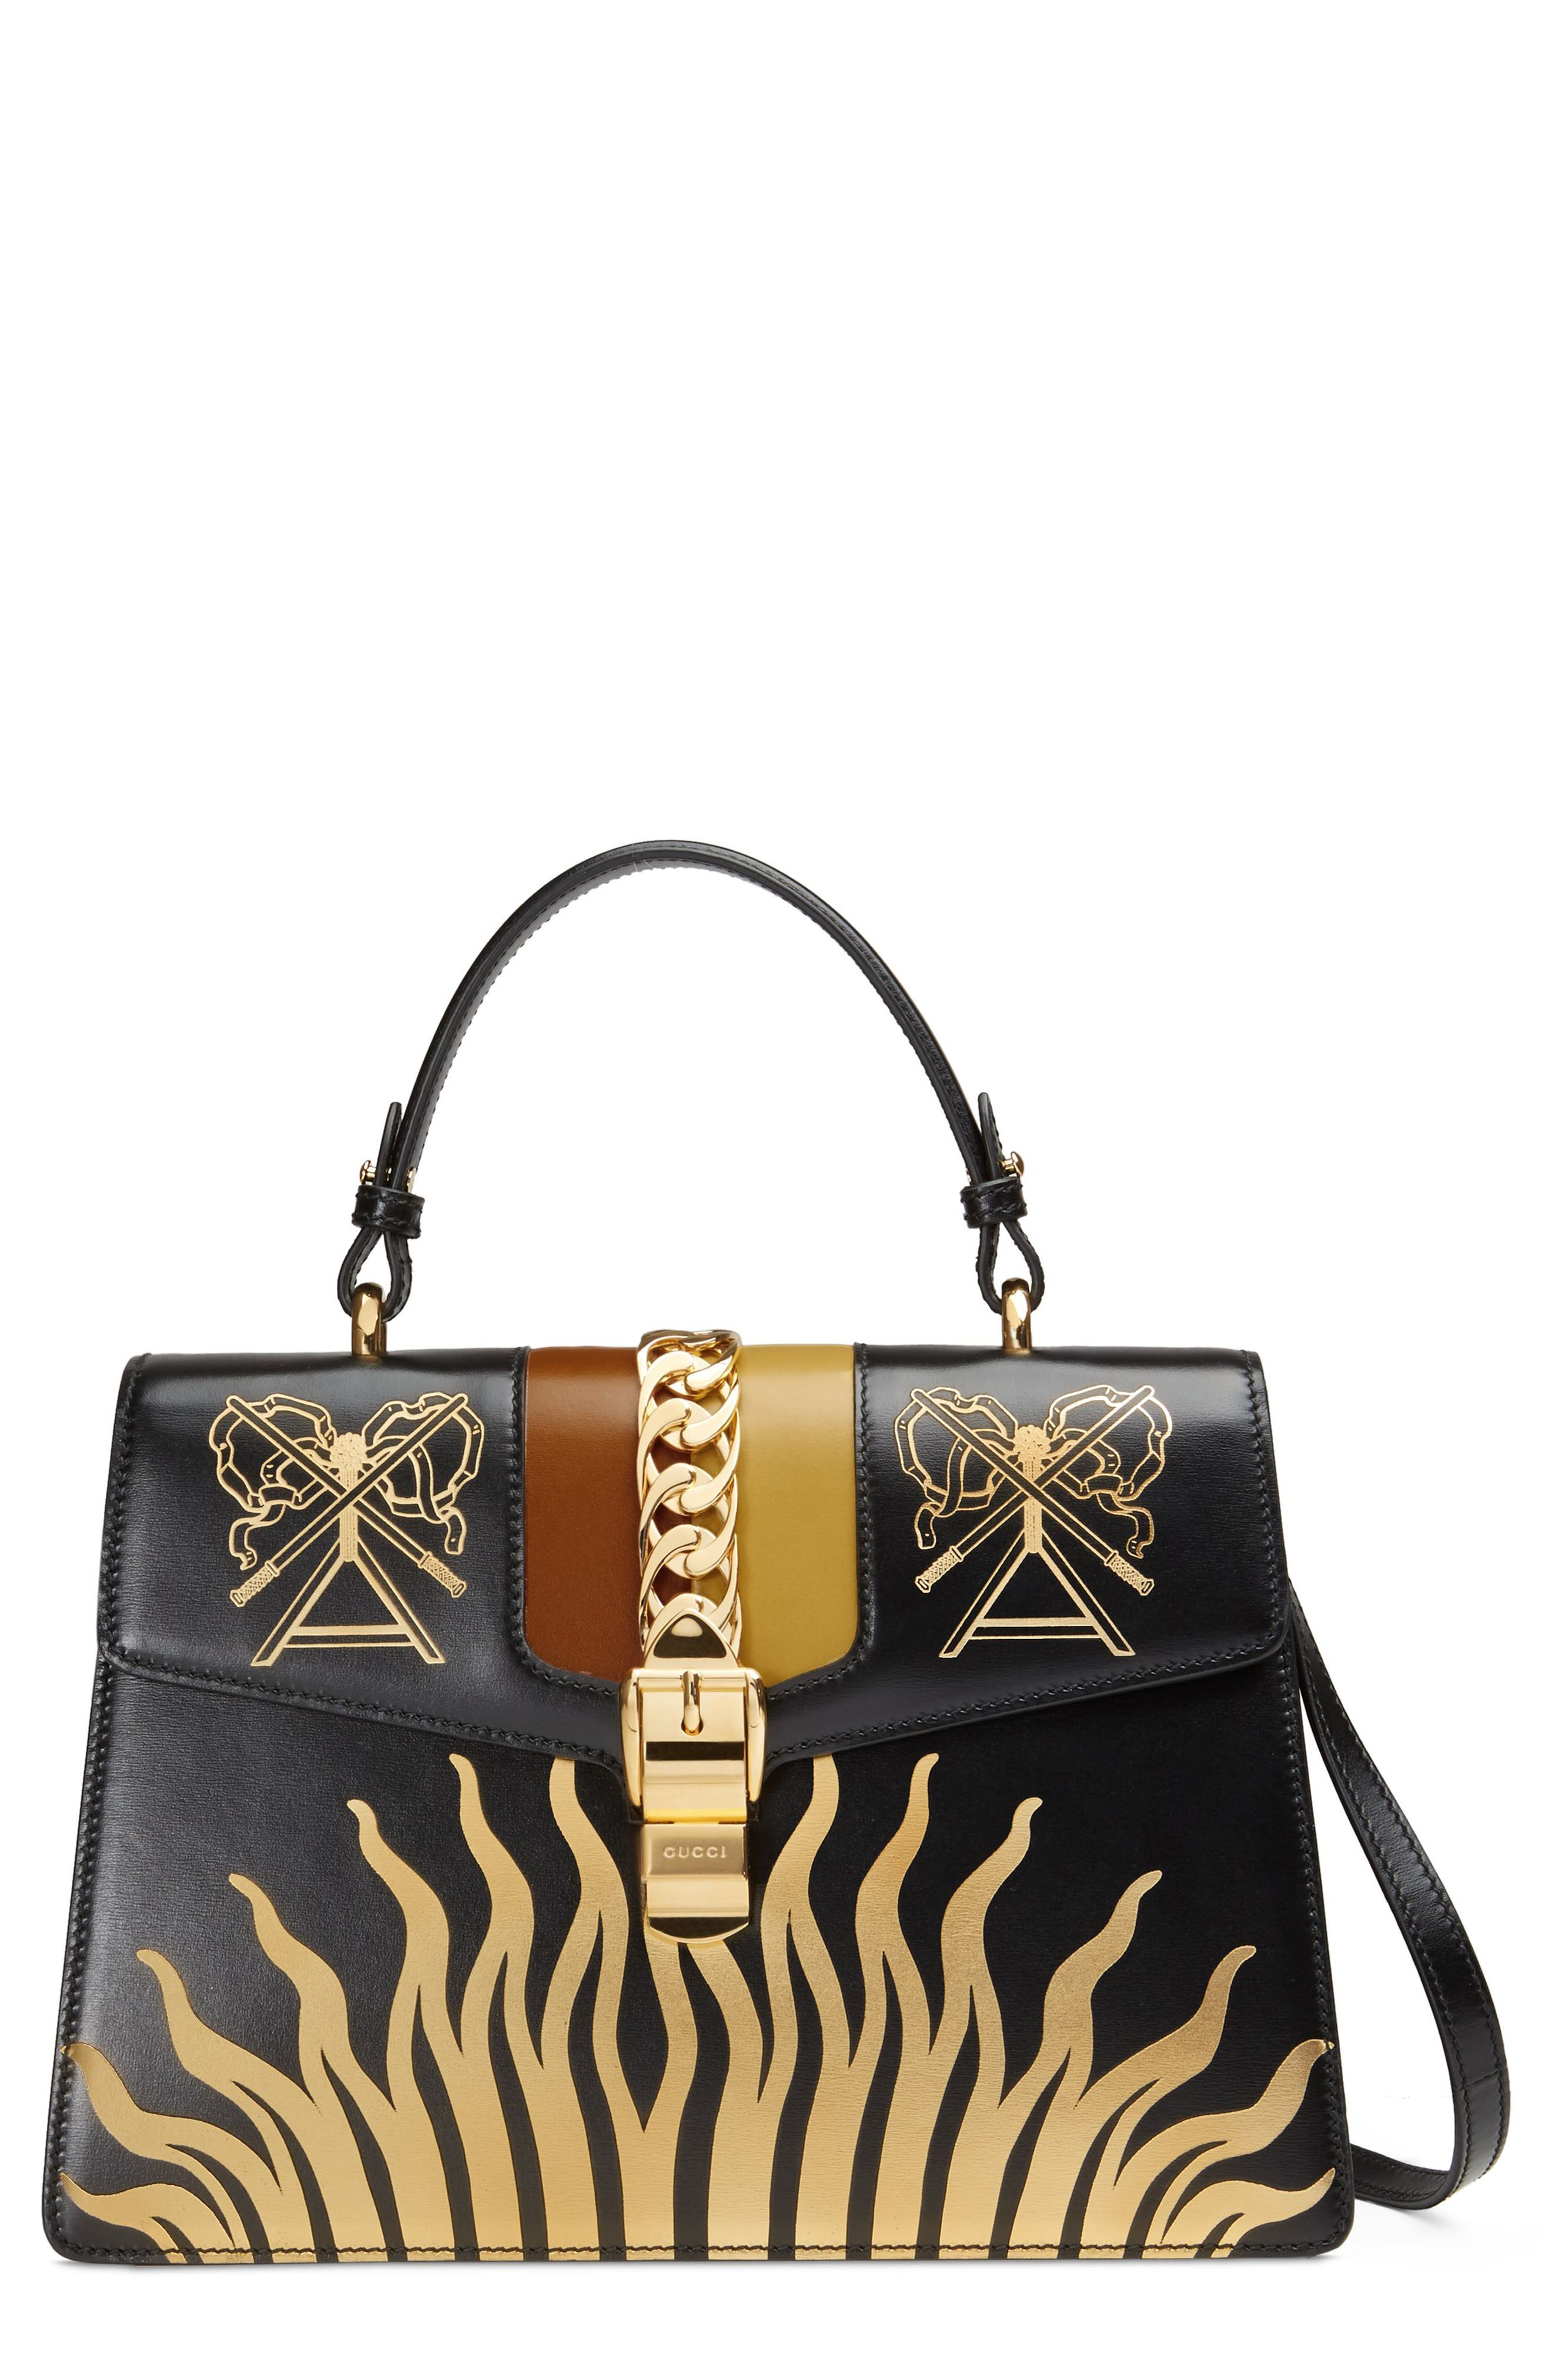 Medium Sylvie Top Handle Leather Bag,                             Main thumbnail 1, color,                             BLACK GOLD/ CARAMEL/ OCHRE